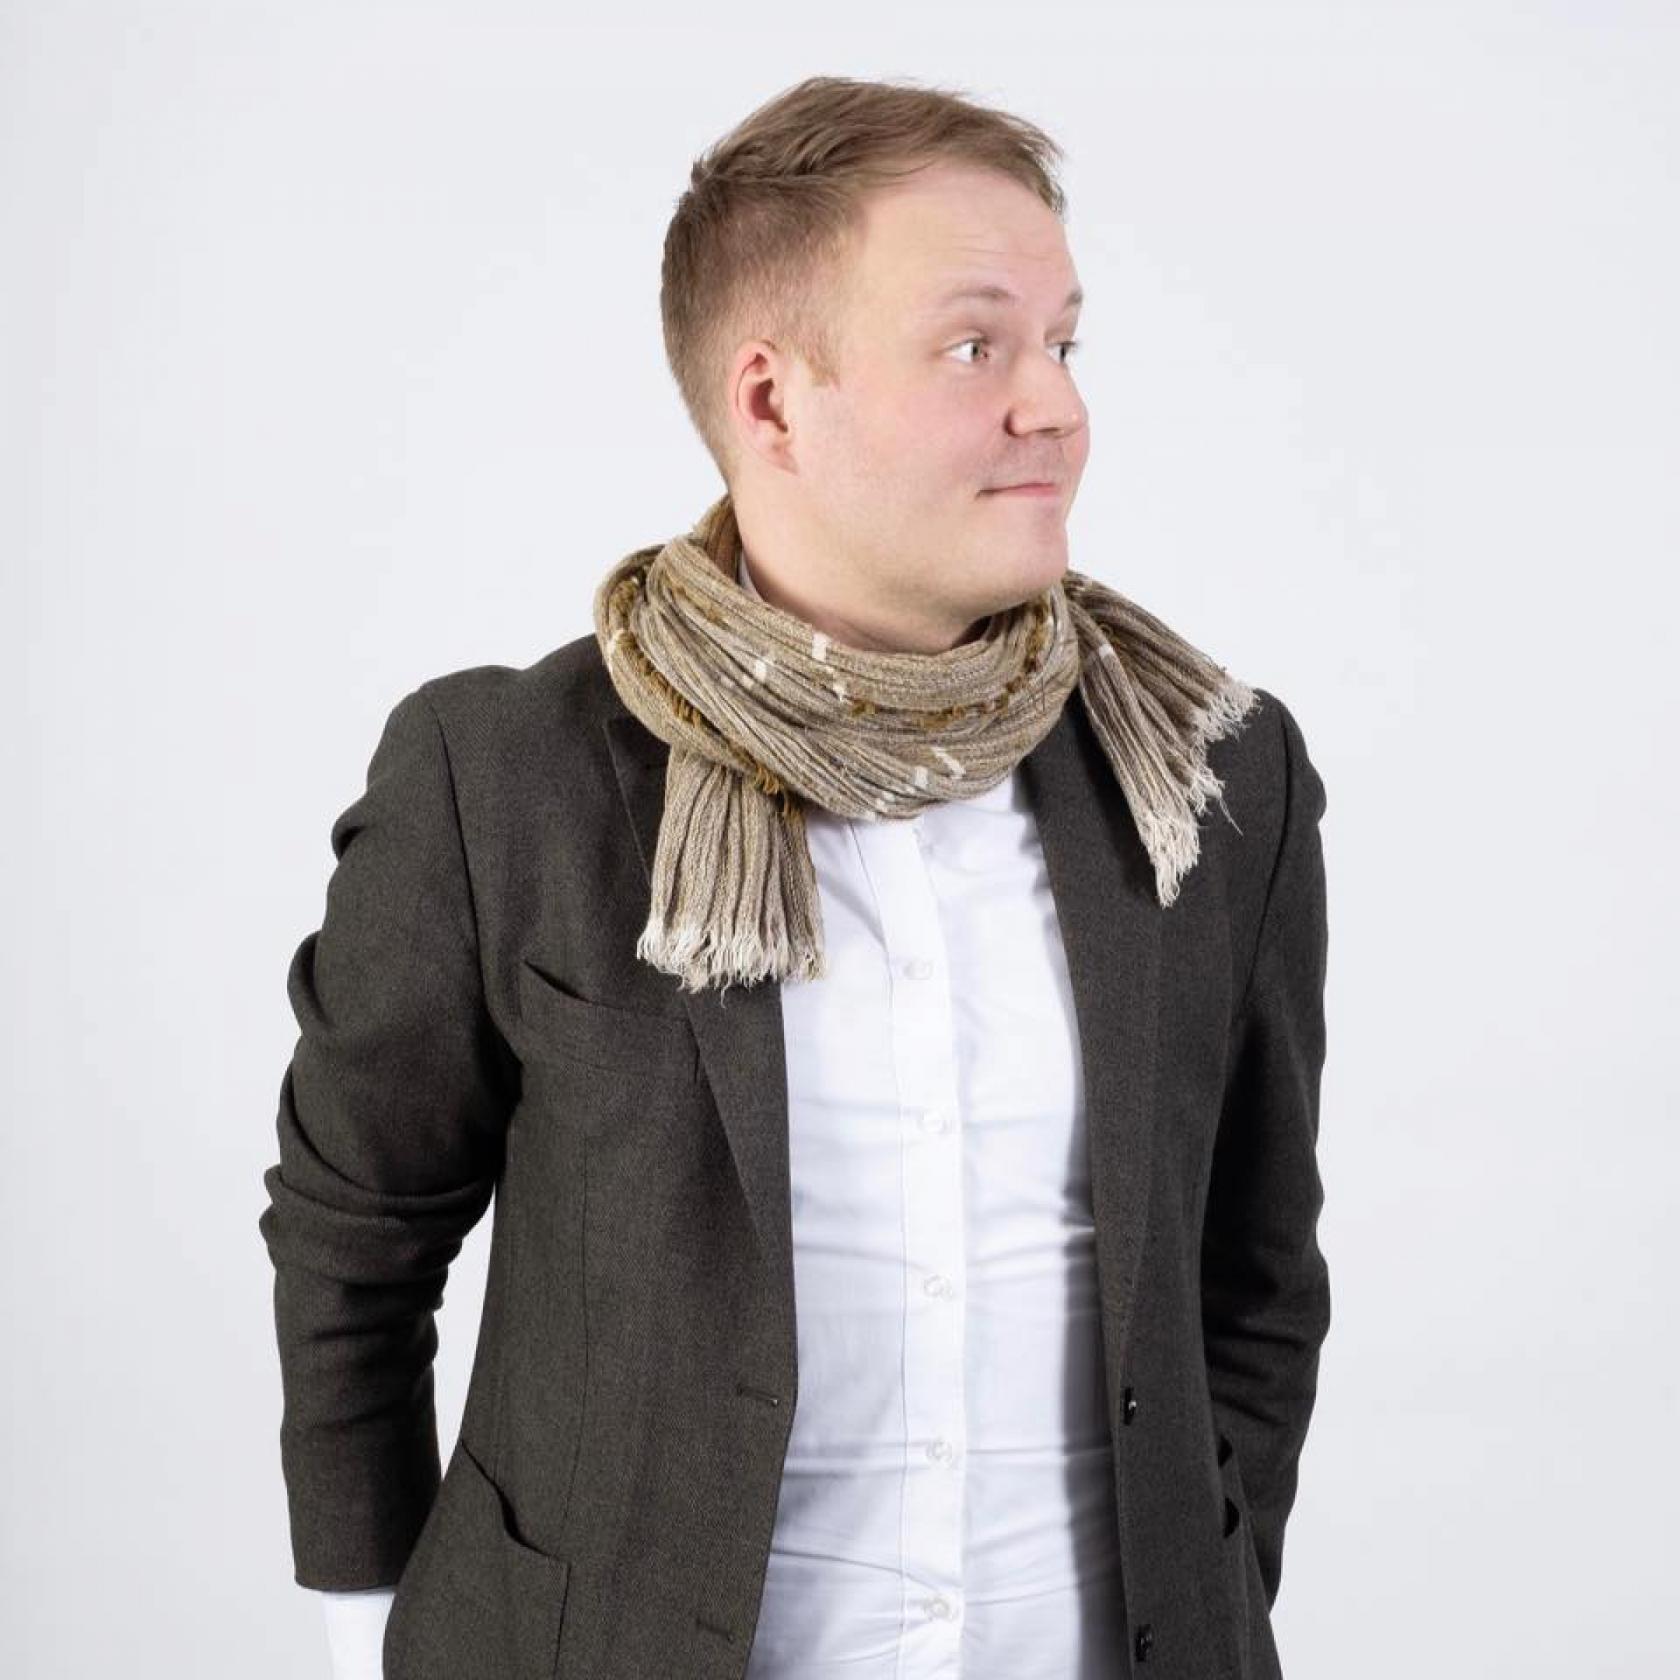 Peter Silvennoinen